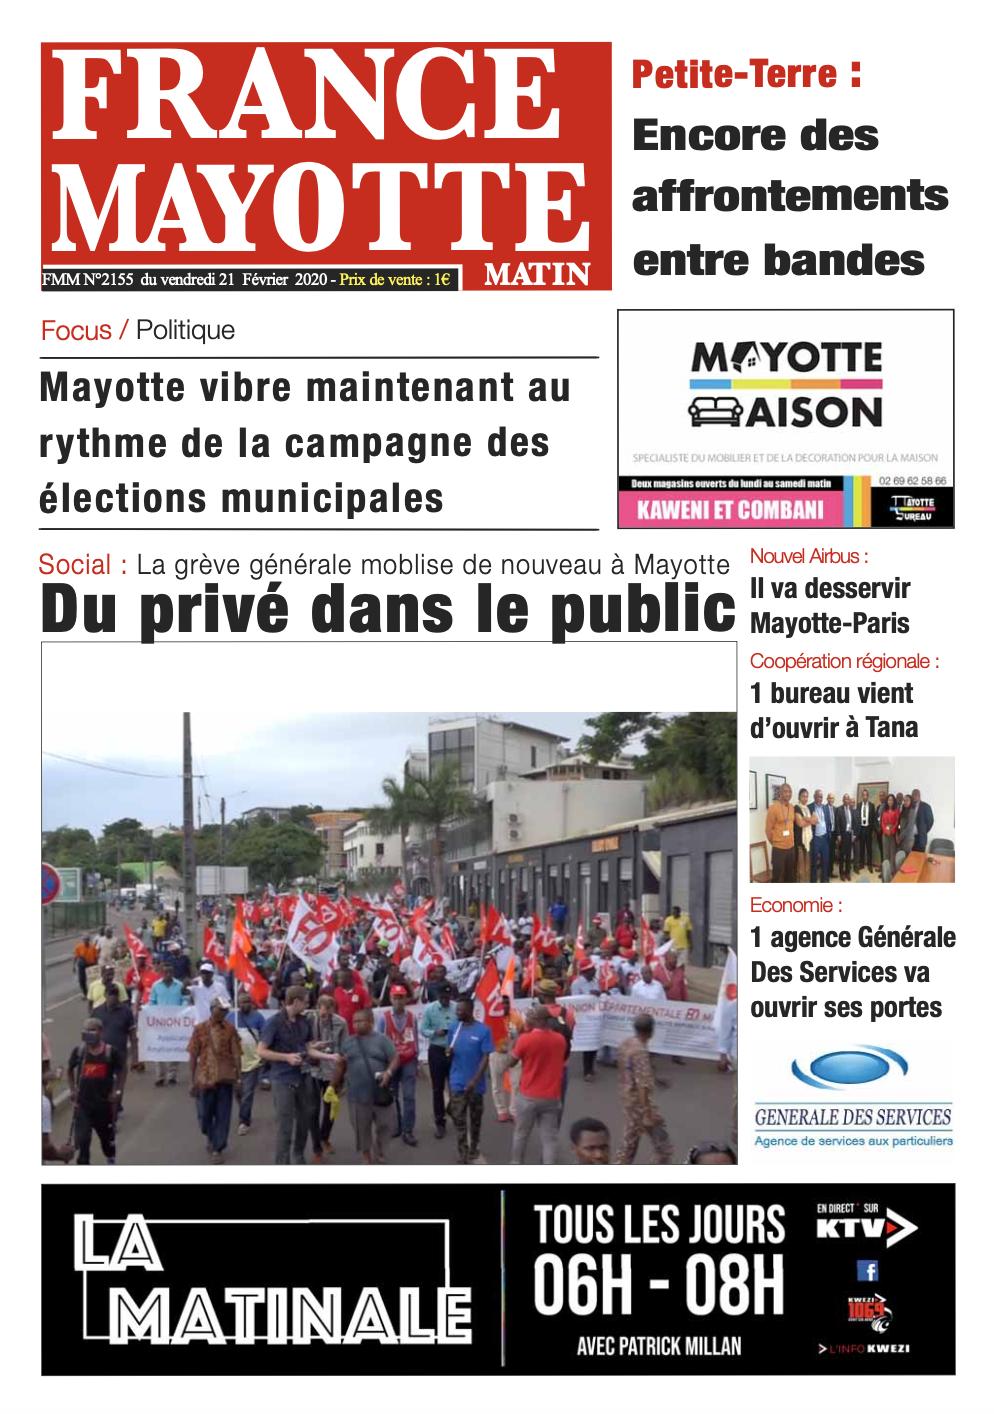 France Mayotte Vendredi 21 février 2020